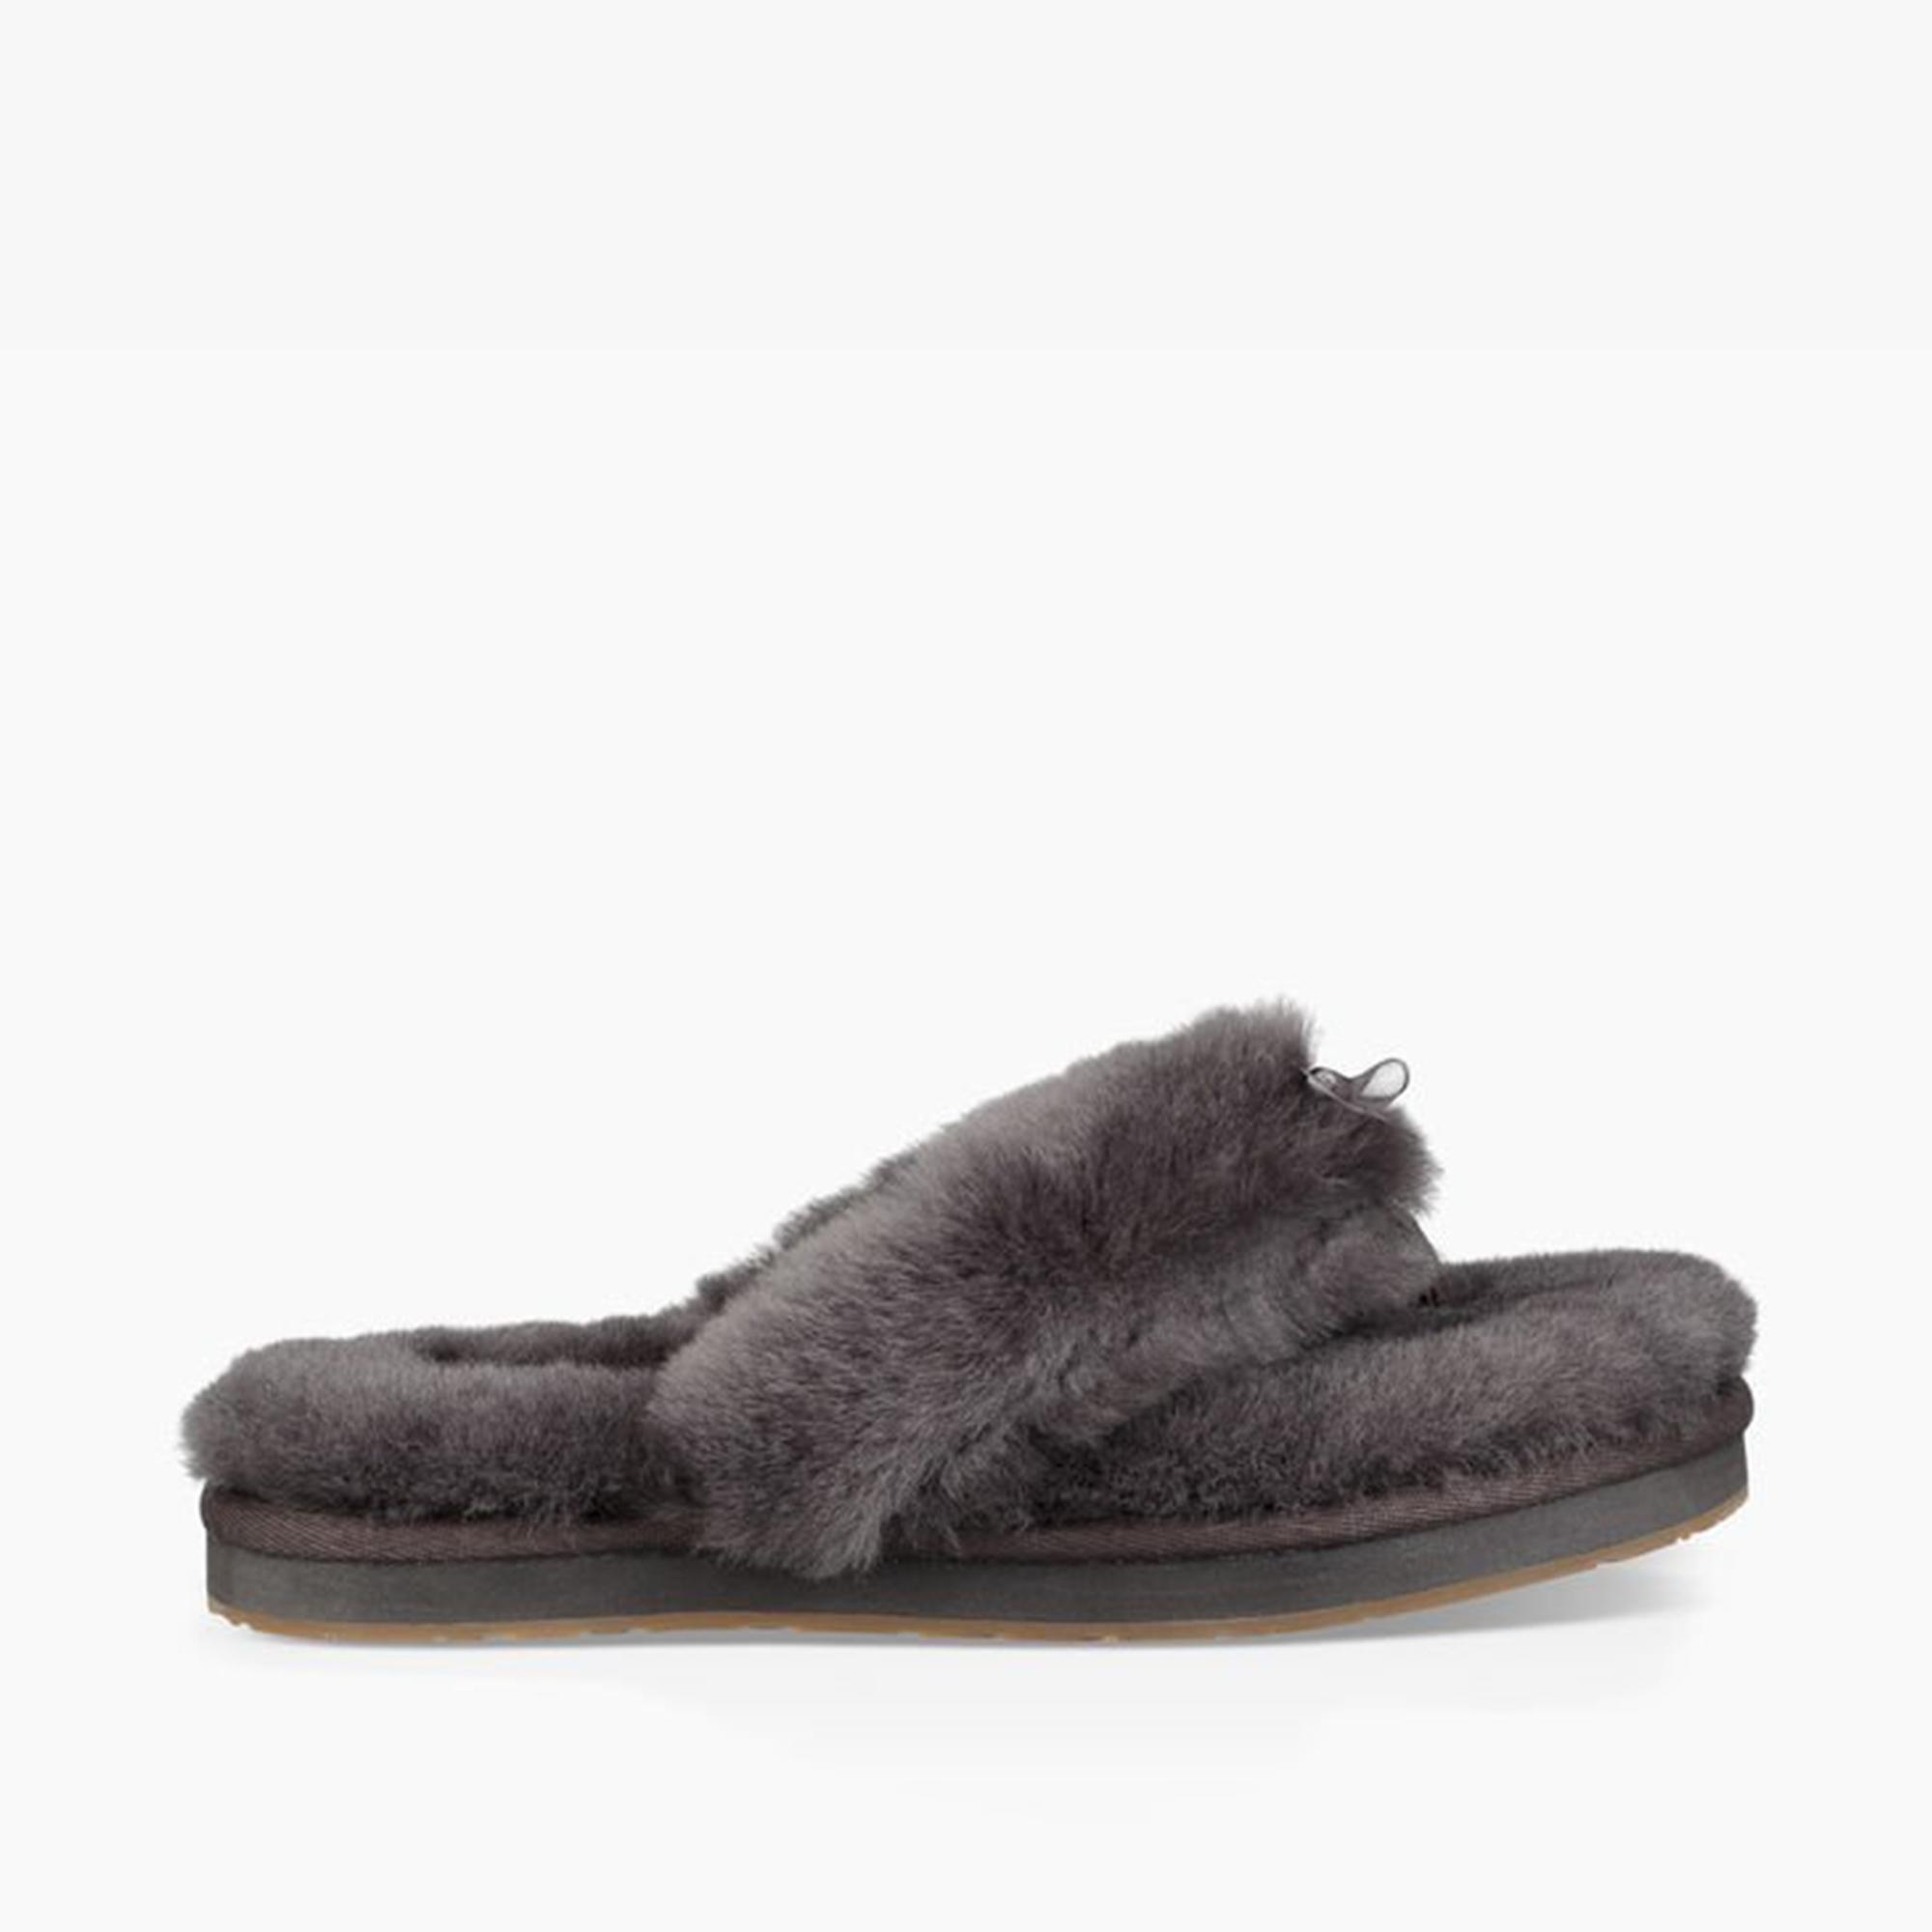 e8042daa982 UGG FLUFF FLIP FLOP III Ladies Toe Post Slippers Grey